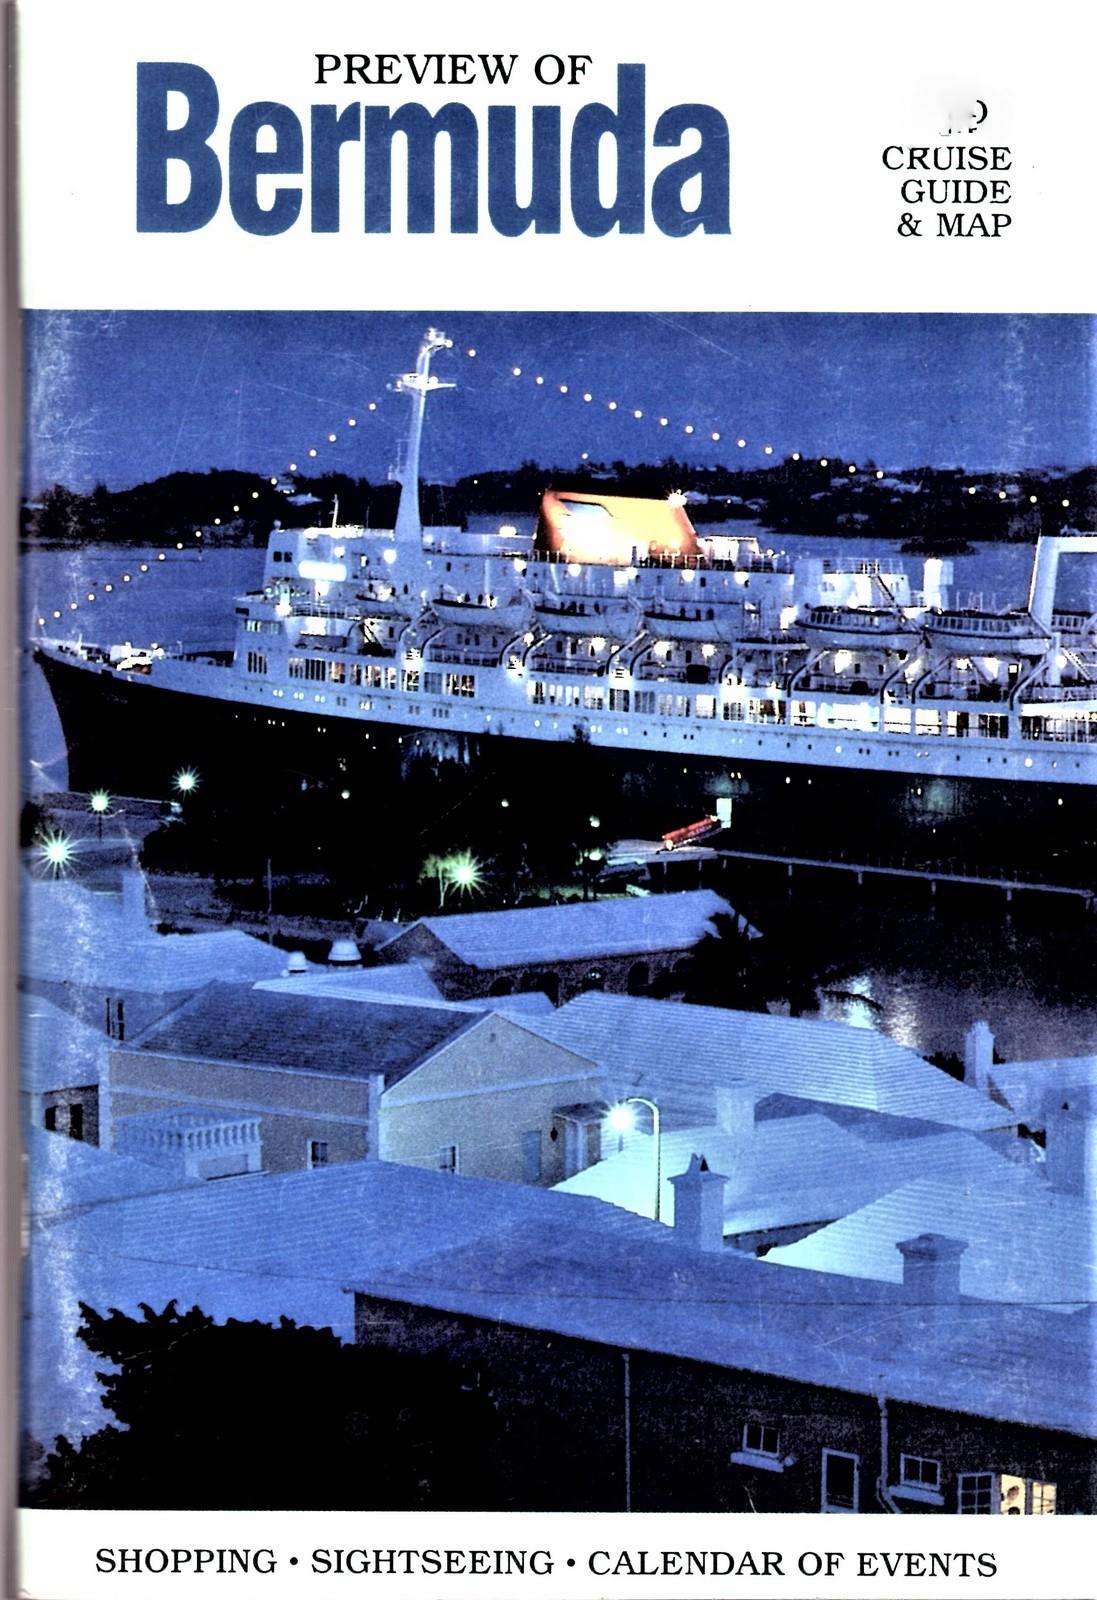 Bermuda (4 Books) image 8